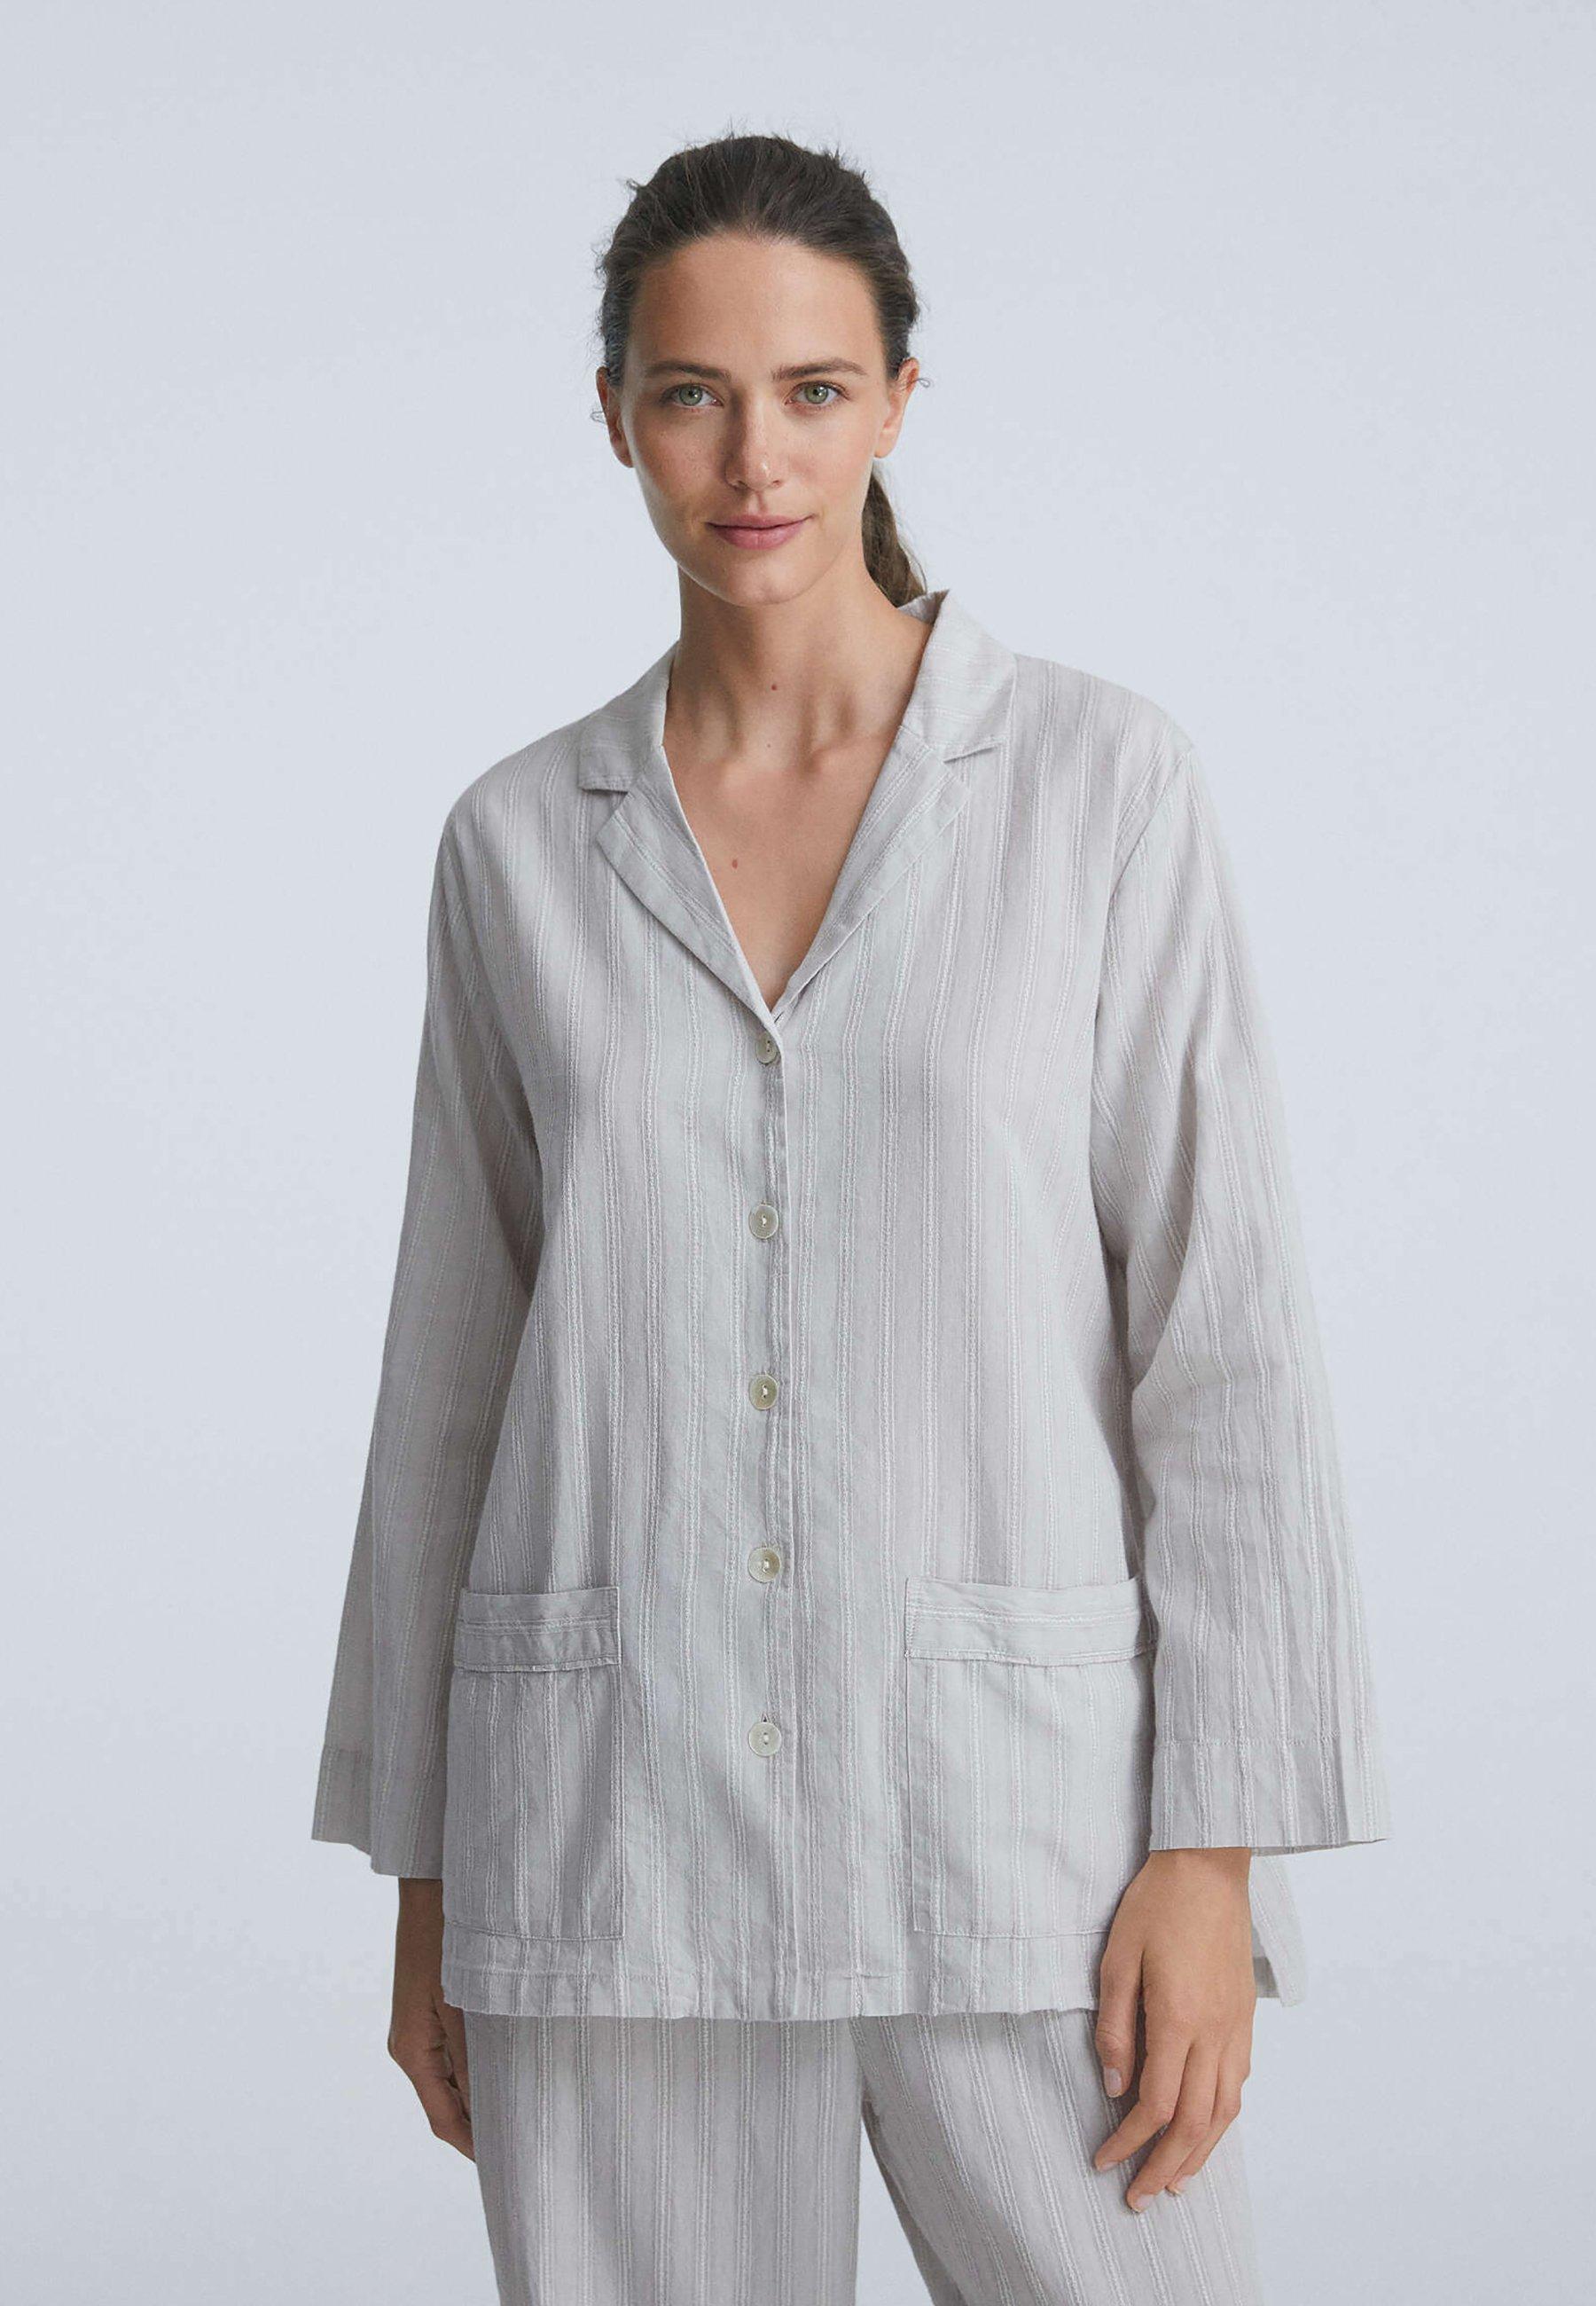 Damen TEXTURED STRIPE LONG-SLEEVED - Nachtwäsche Shirt